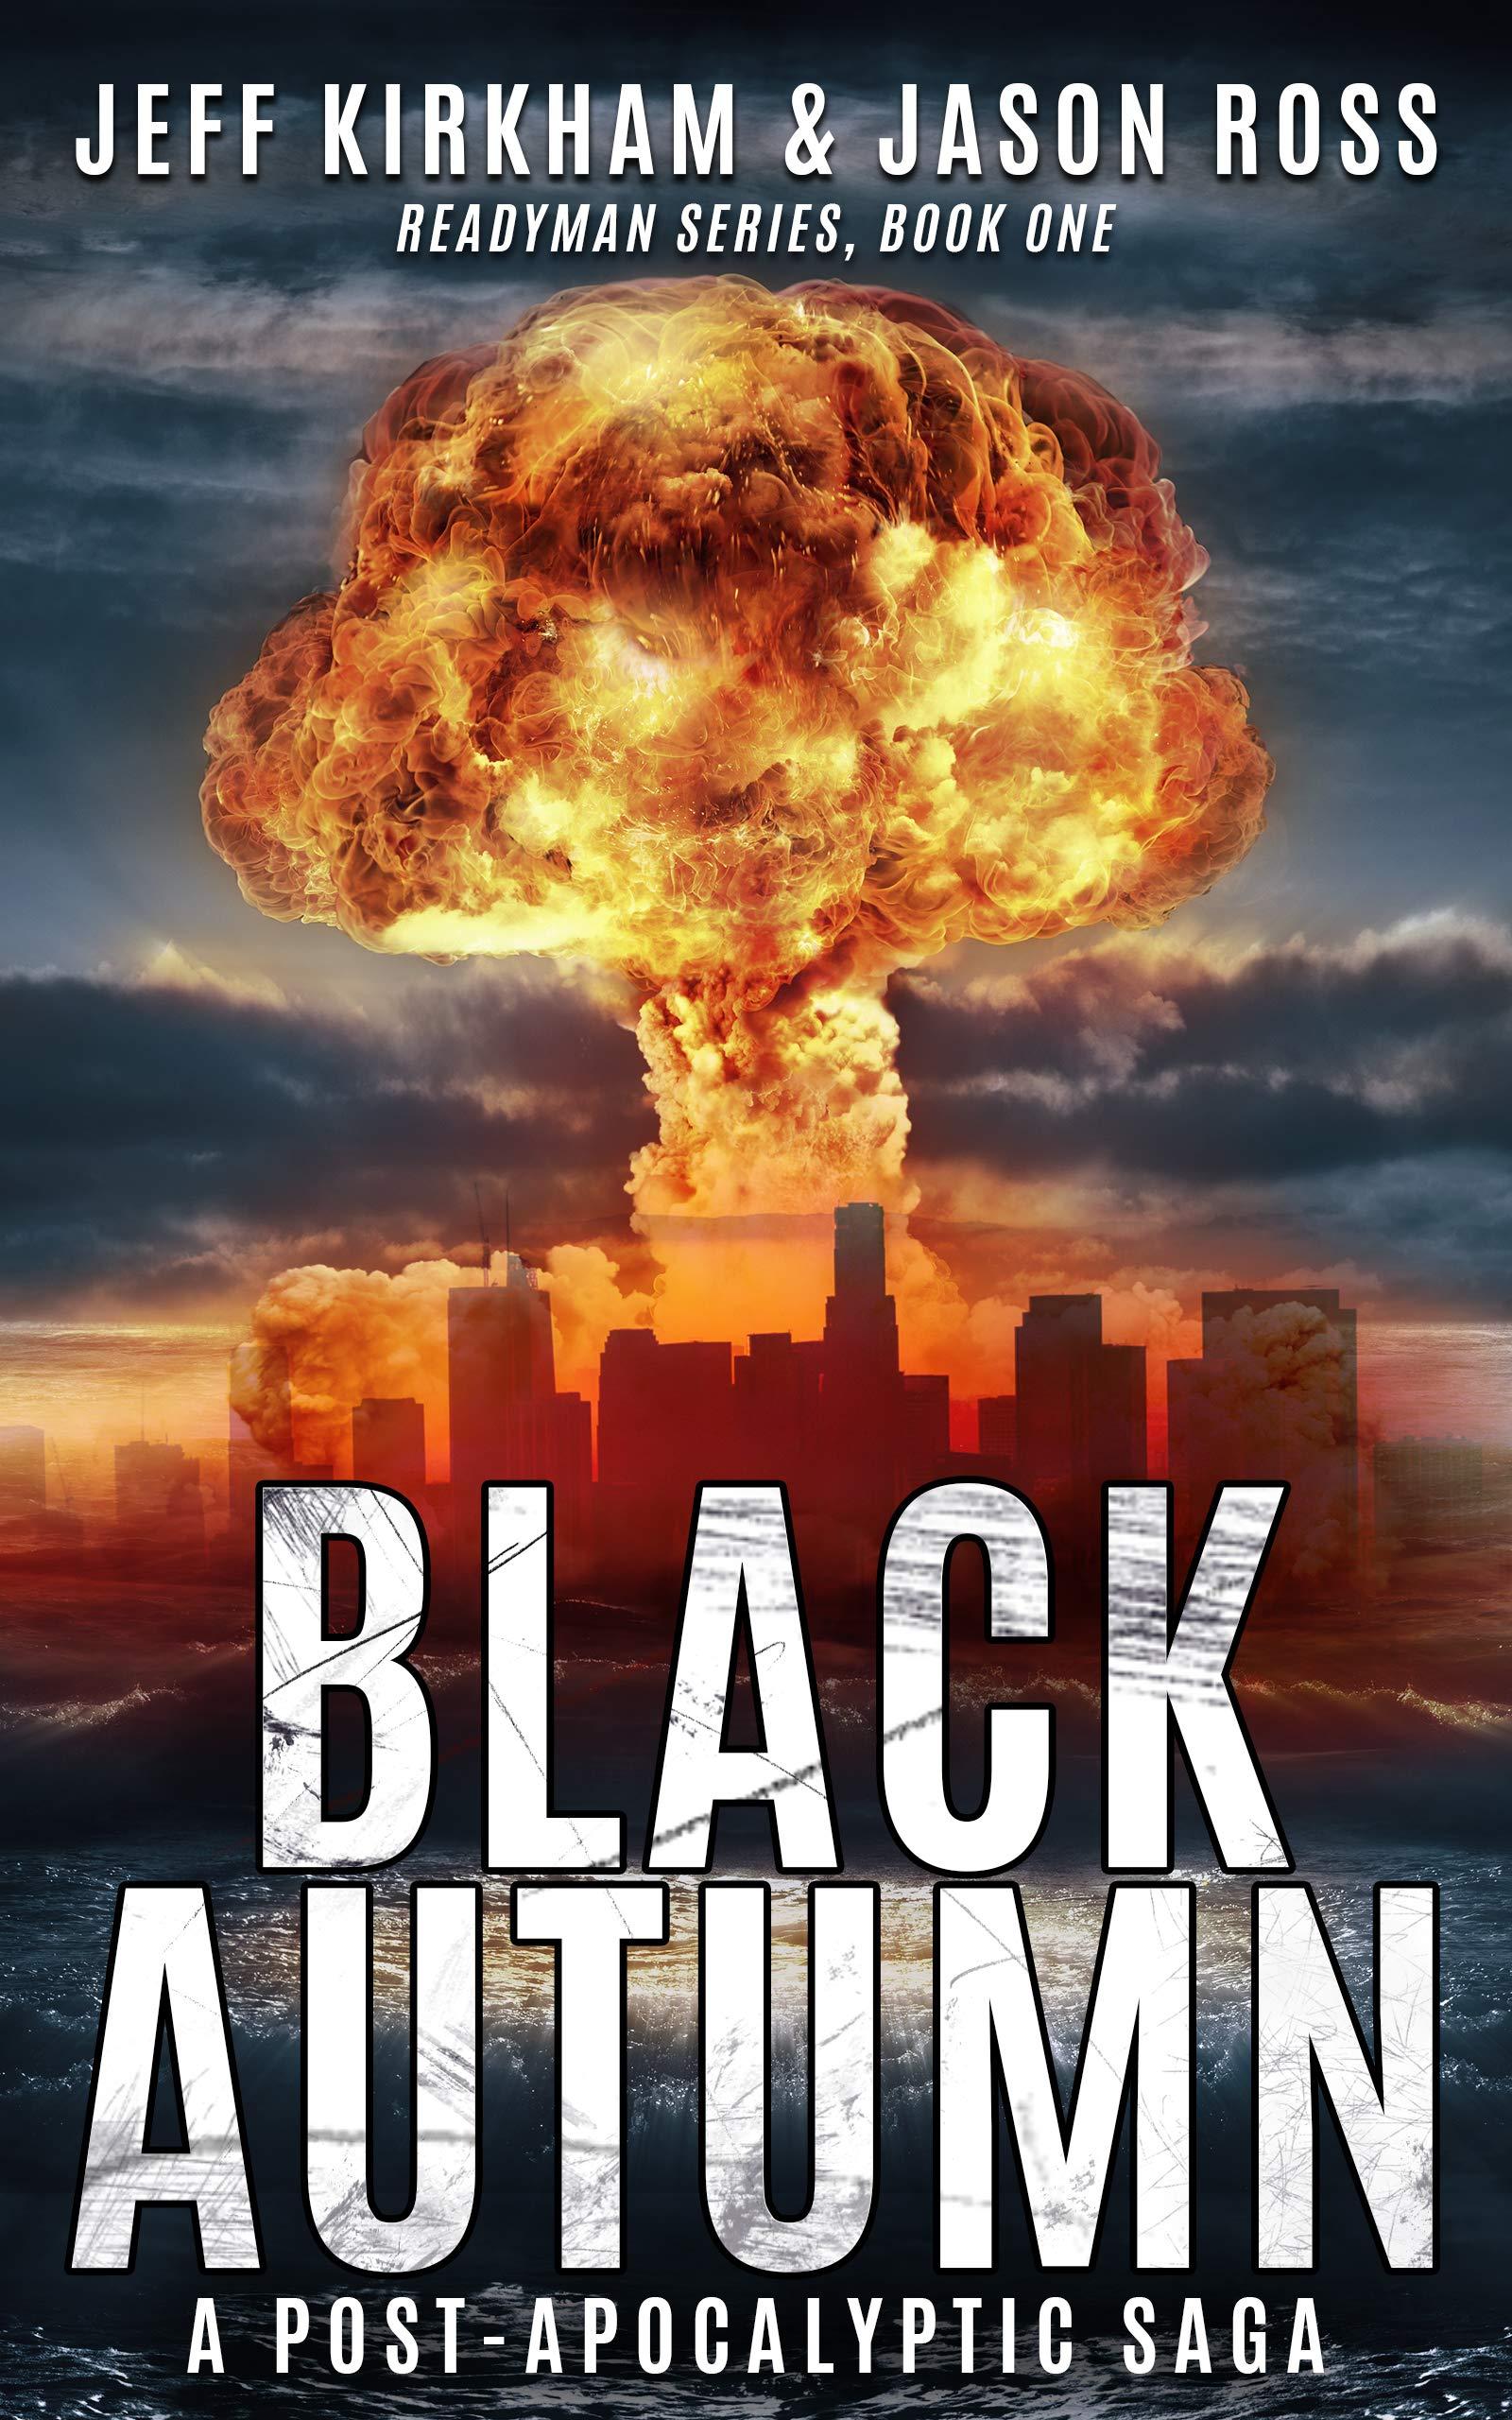 Black Autumn: A Post-Apocalyptic Saga (READYMAN SERIES, BOOK ONE): Jeff  Kirkham, Jason Ross: 9781948035170: Amazon.com: Books